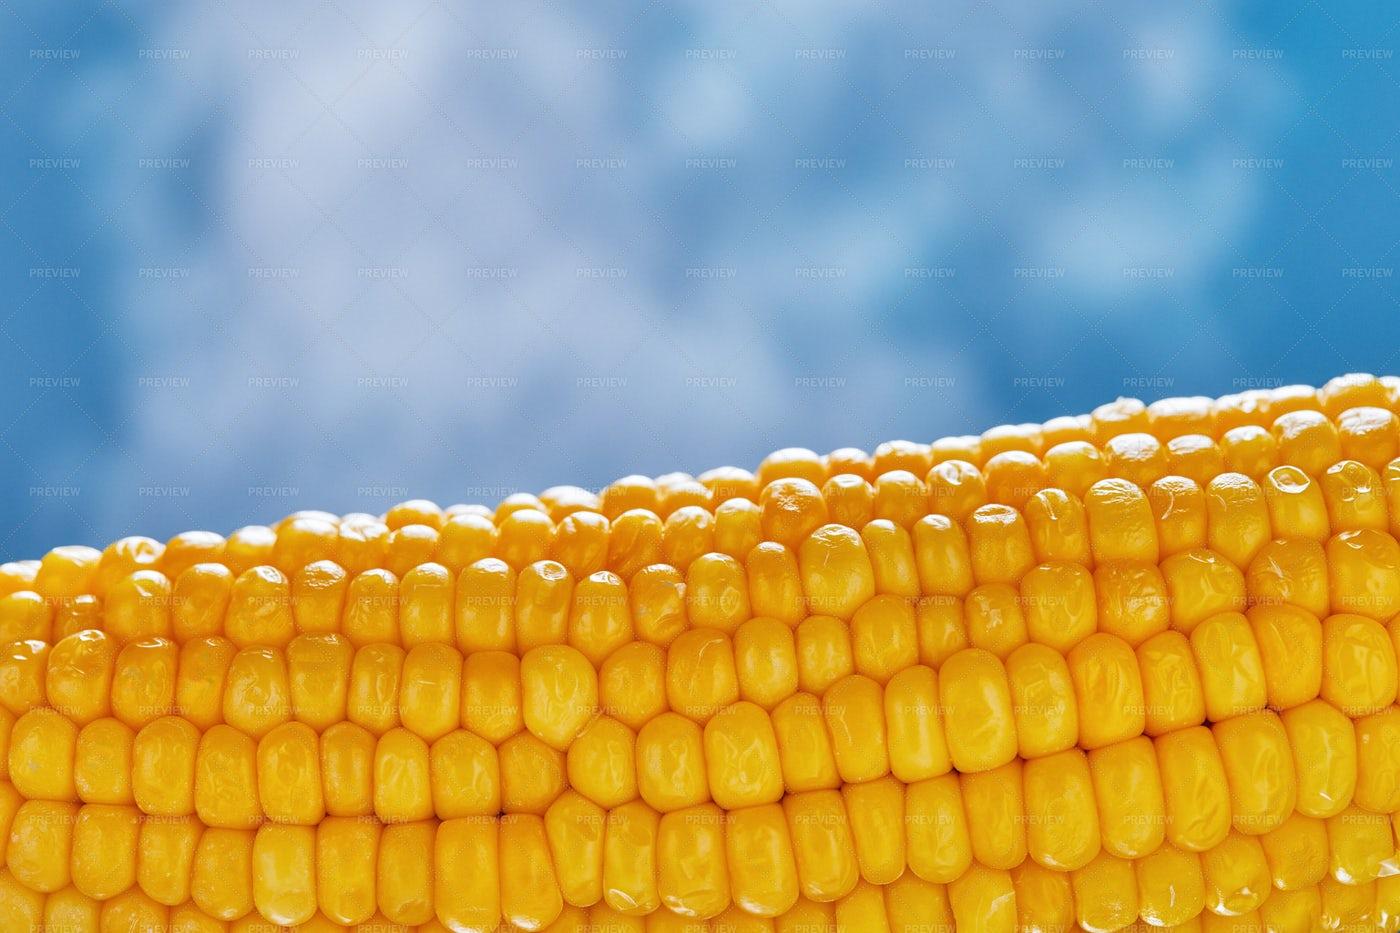 Steam Rising Off Corn: Stock Photos